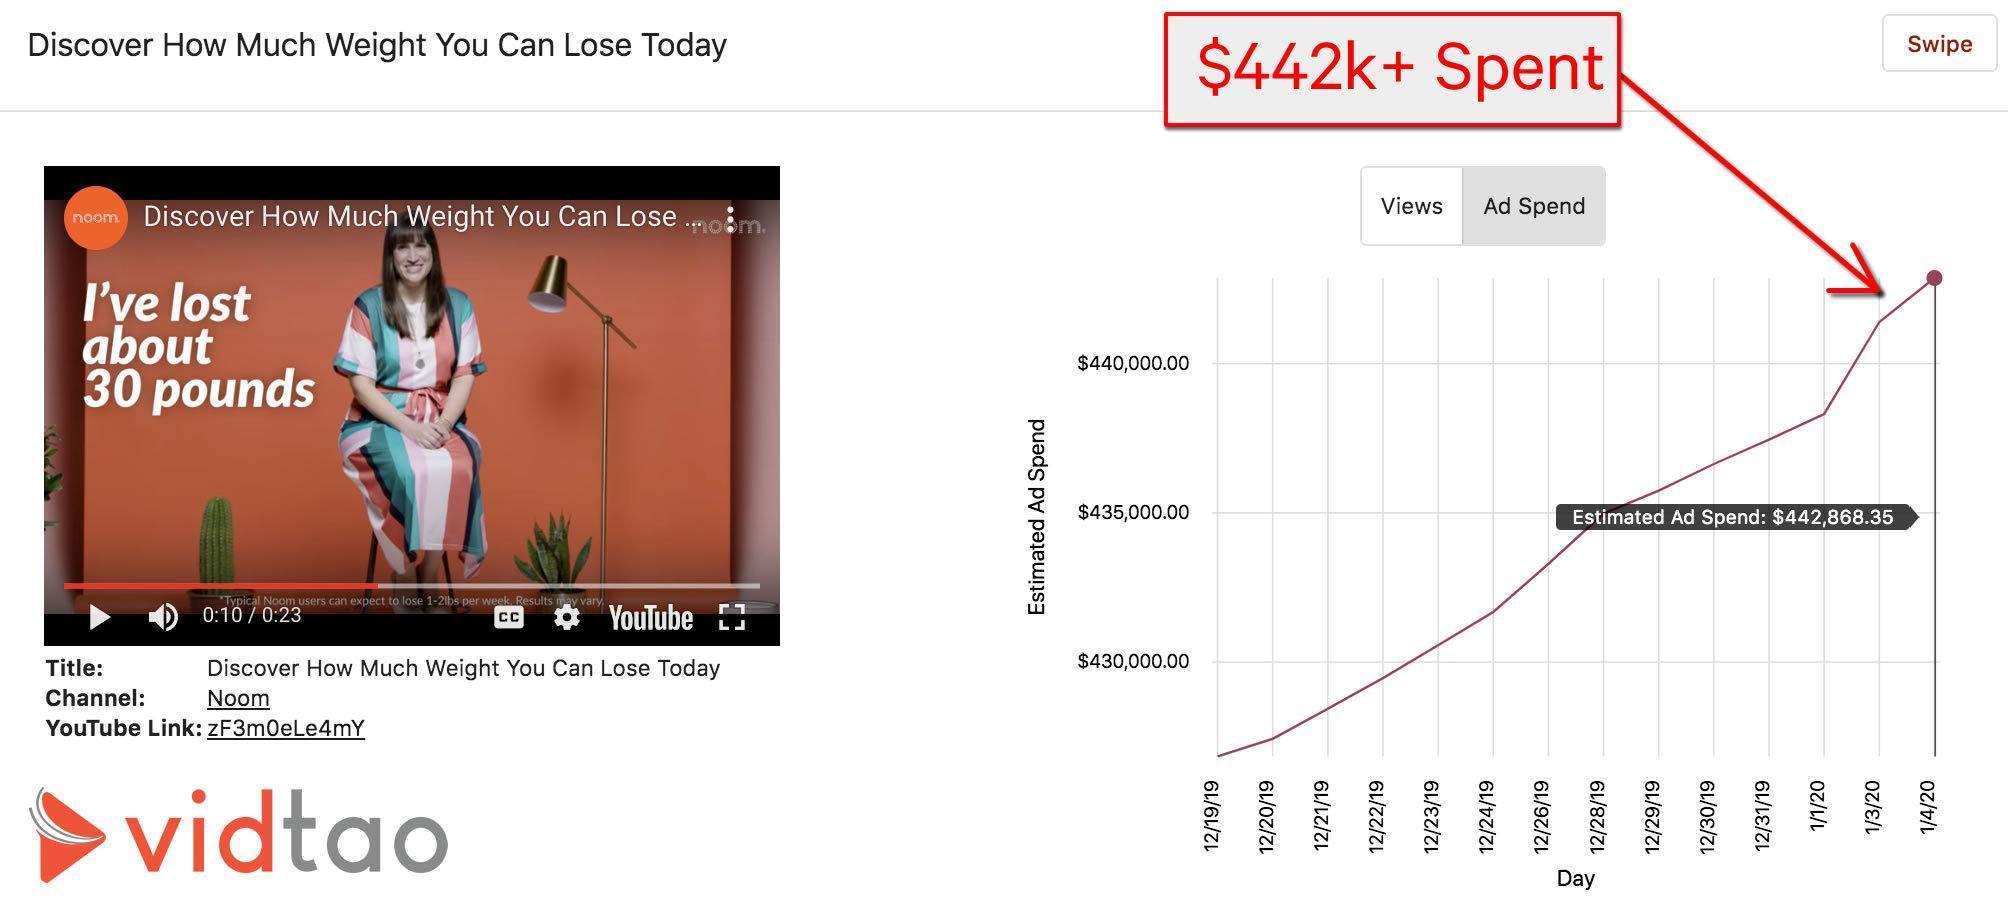 youtube-ad-spy-tool-screenshot-noom-weight-loss-screenshot-20200101-1